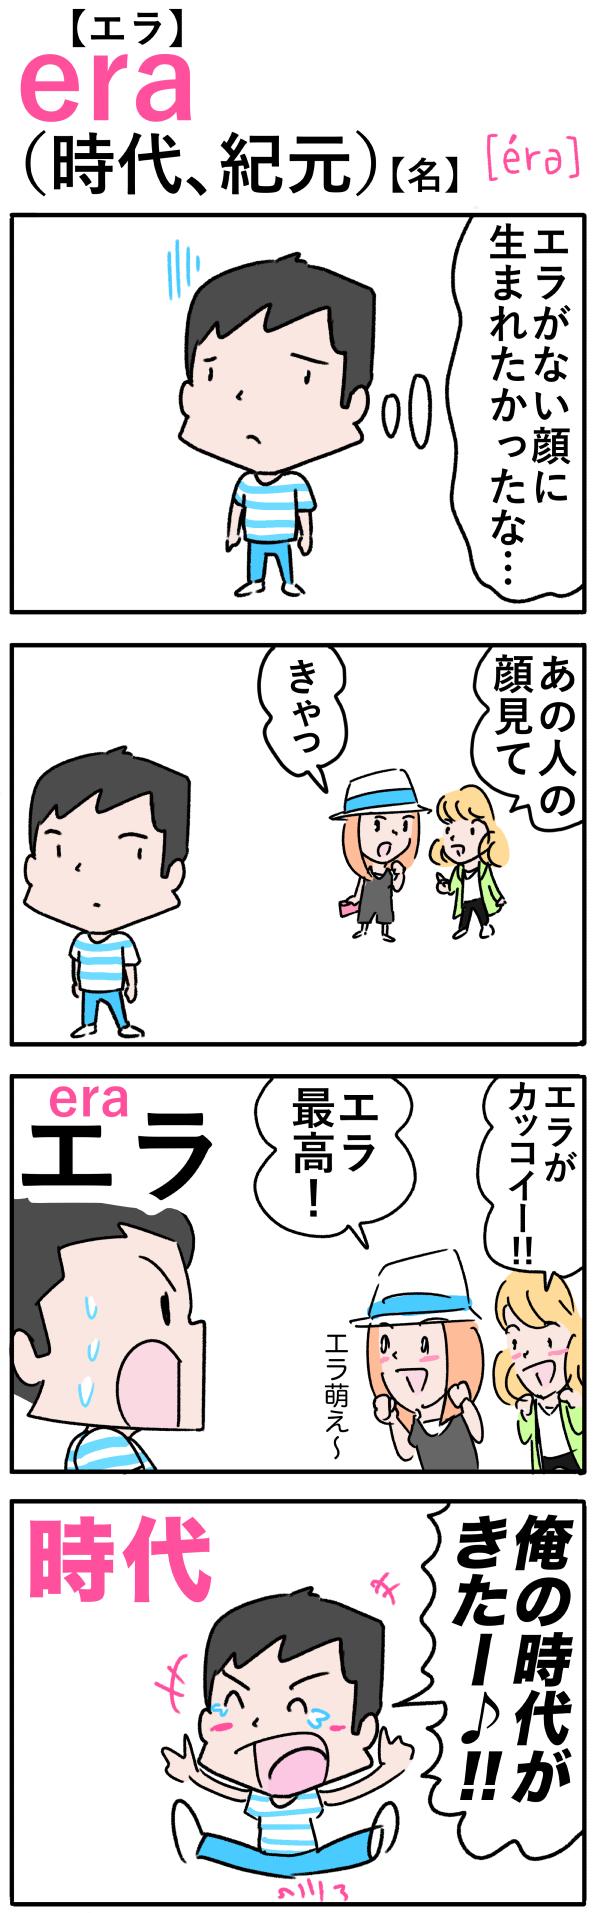 era(時代、紀元)の語呂合わせ英単語